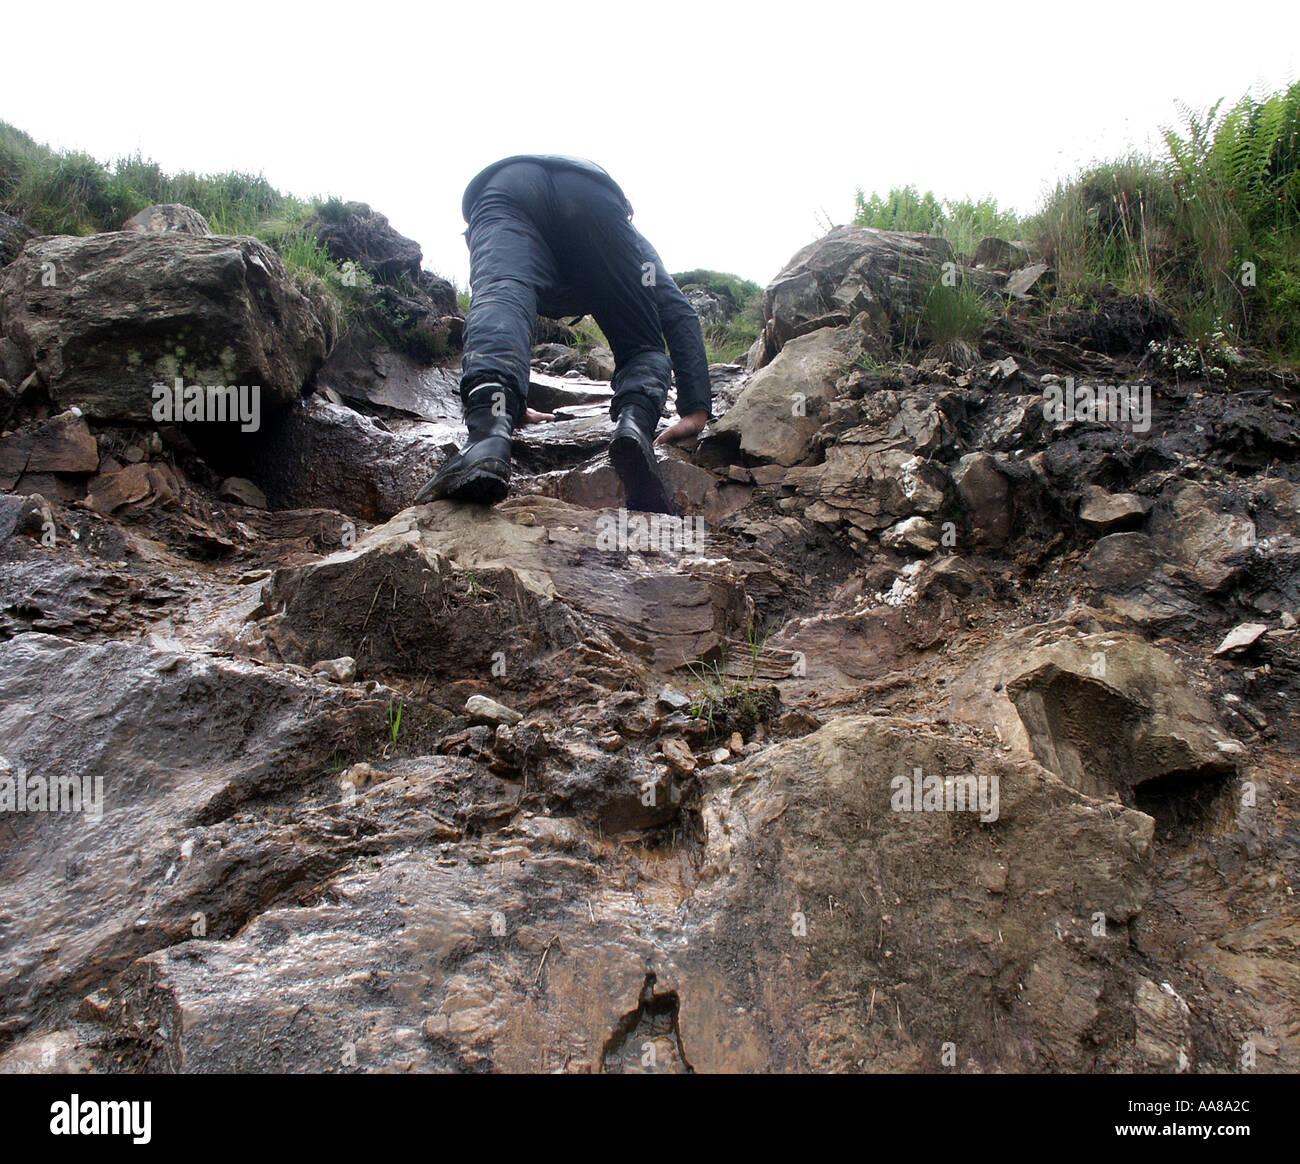 A gentle climb - Stock Image